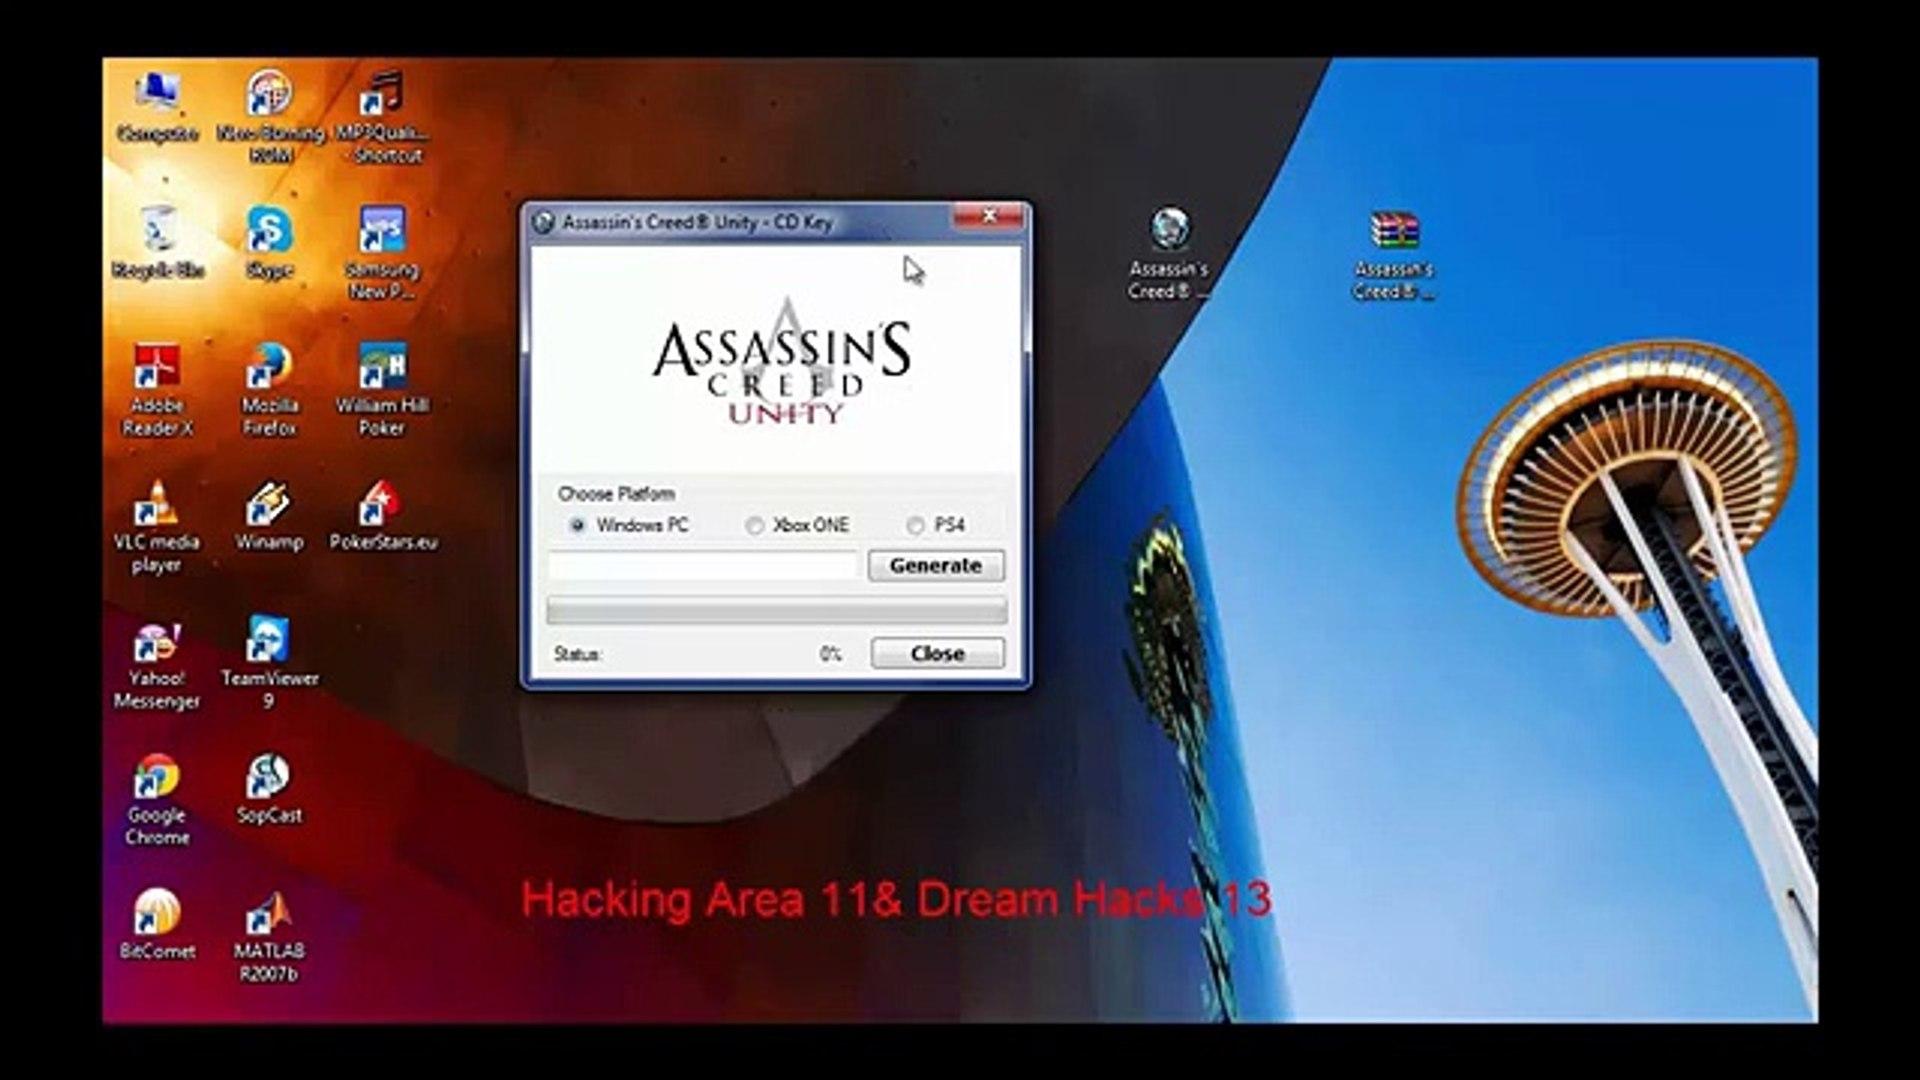 Assassins Creed Unity - CD Key Generator New Update